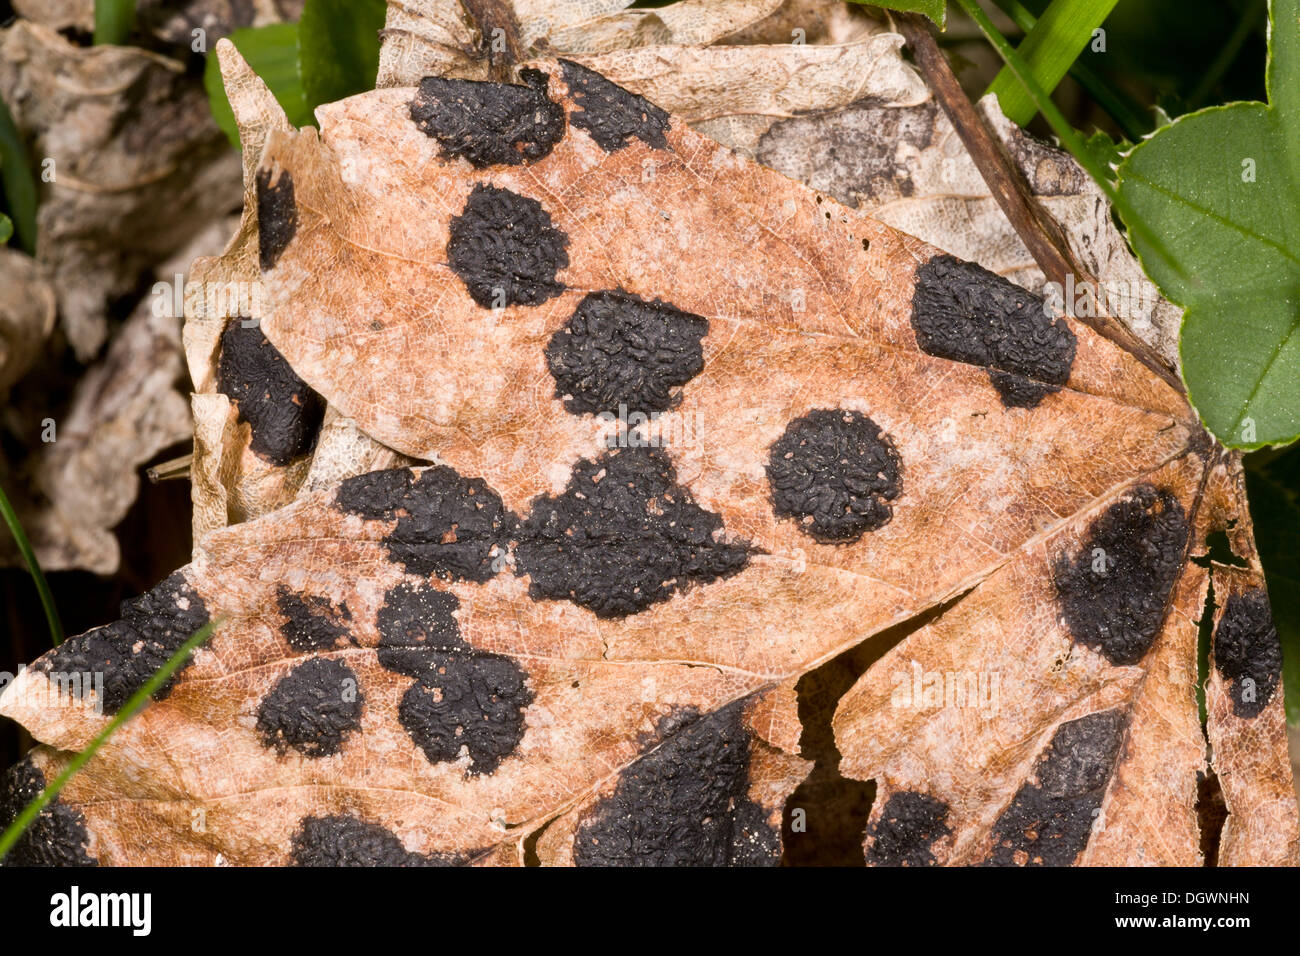 Tar spot fungus, Rhytisma acerinum on Sycamore leaf. - Stock Image